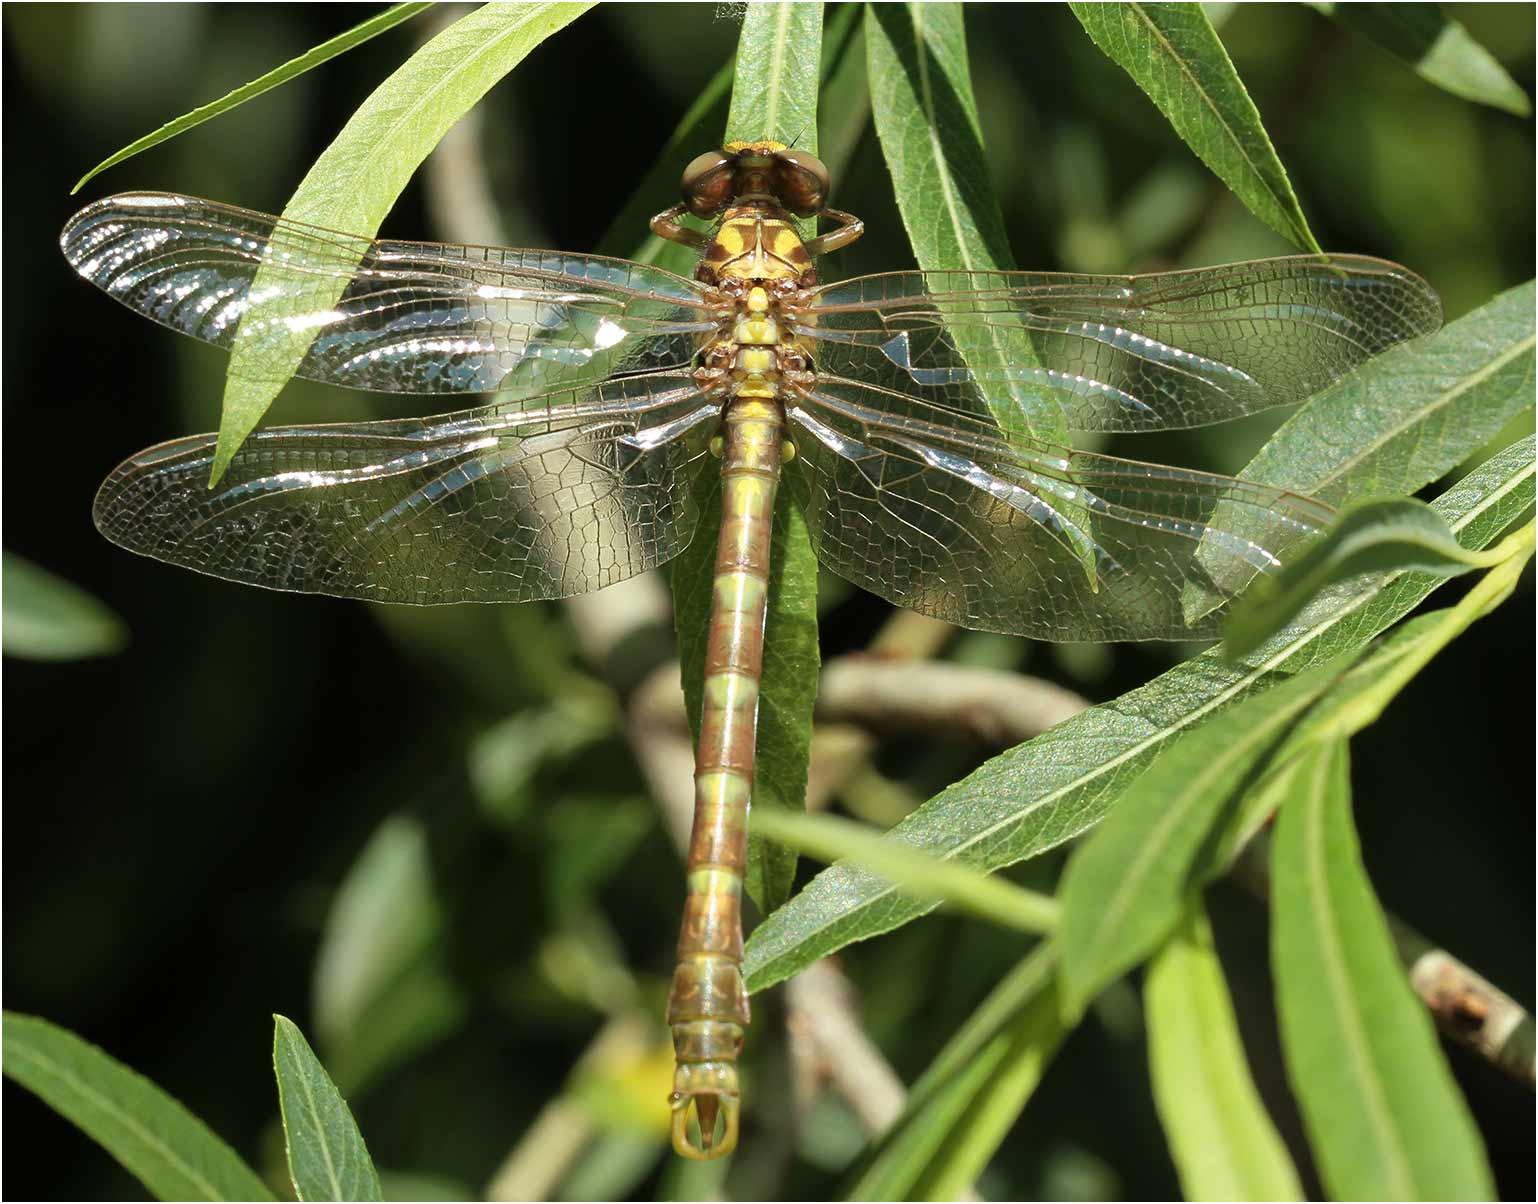 Onychogomphus uncatus mâle émergent, Joyeuse (France-07), 14/06/2013